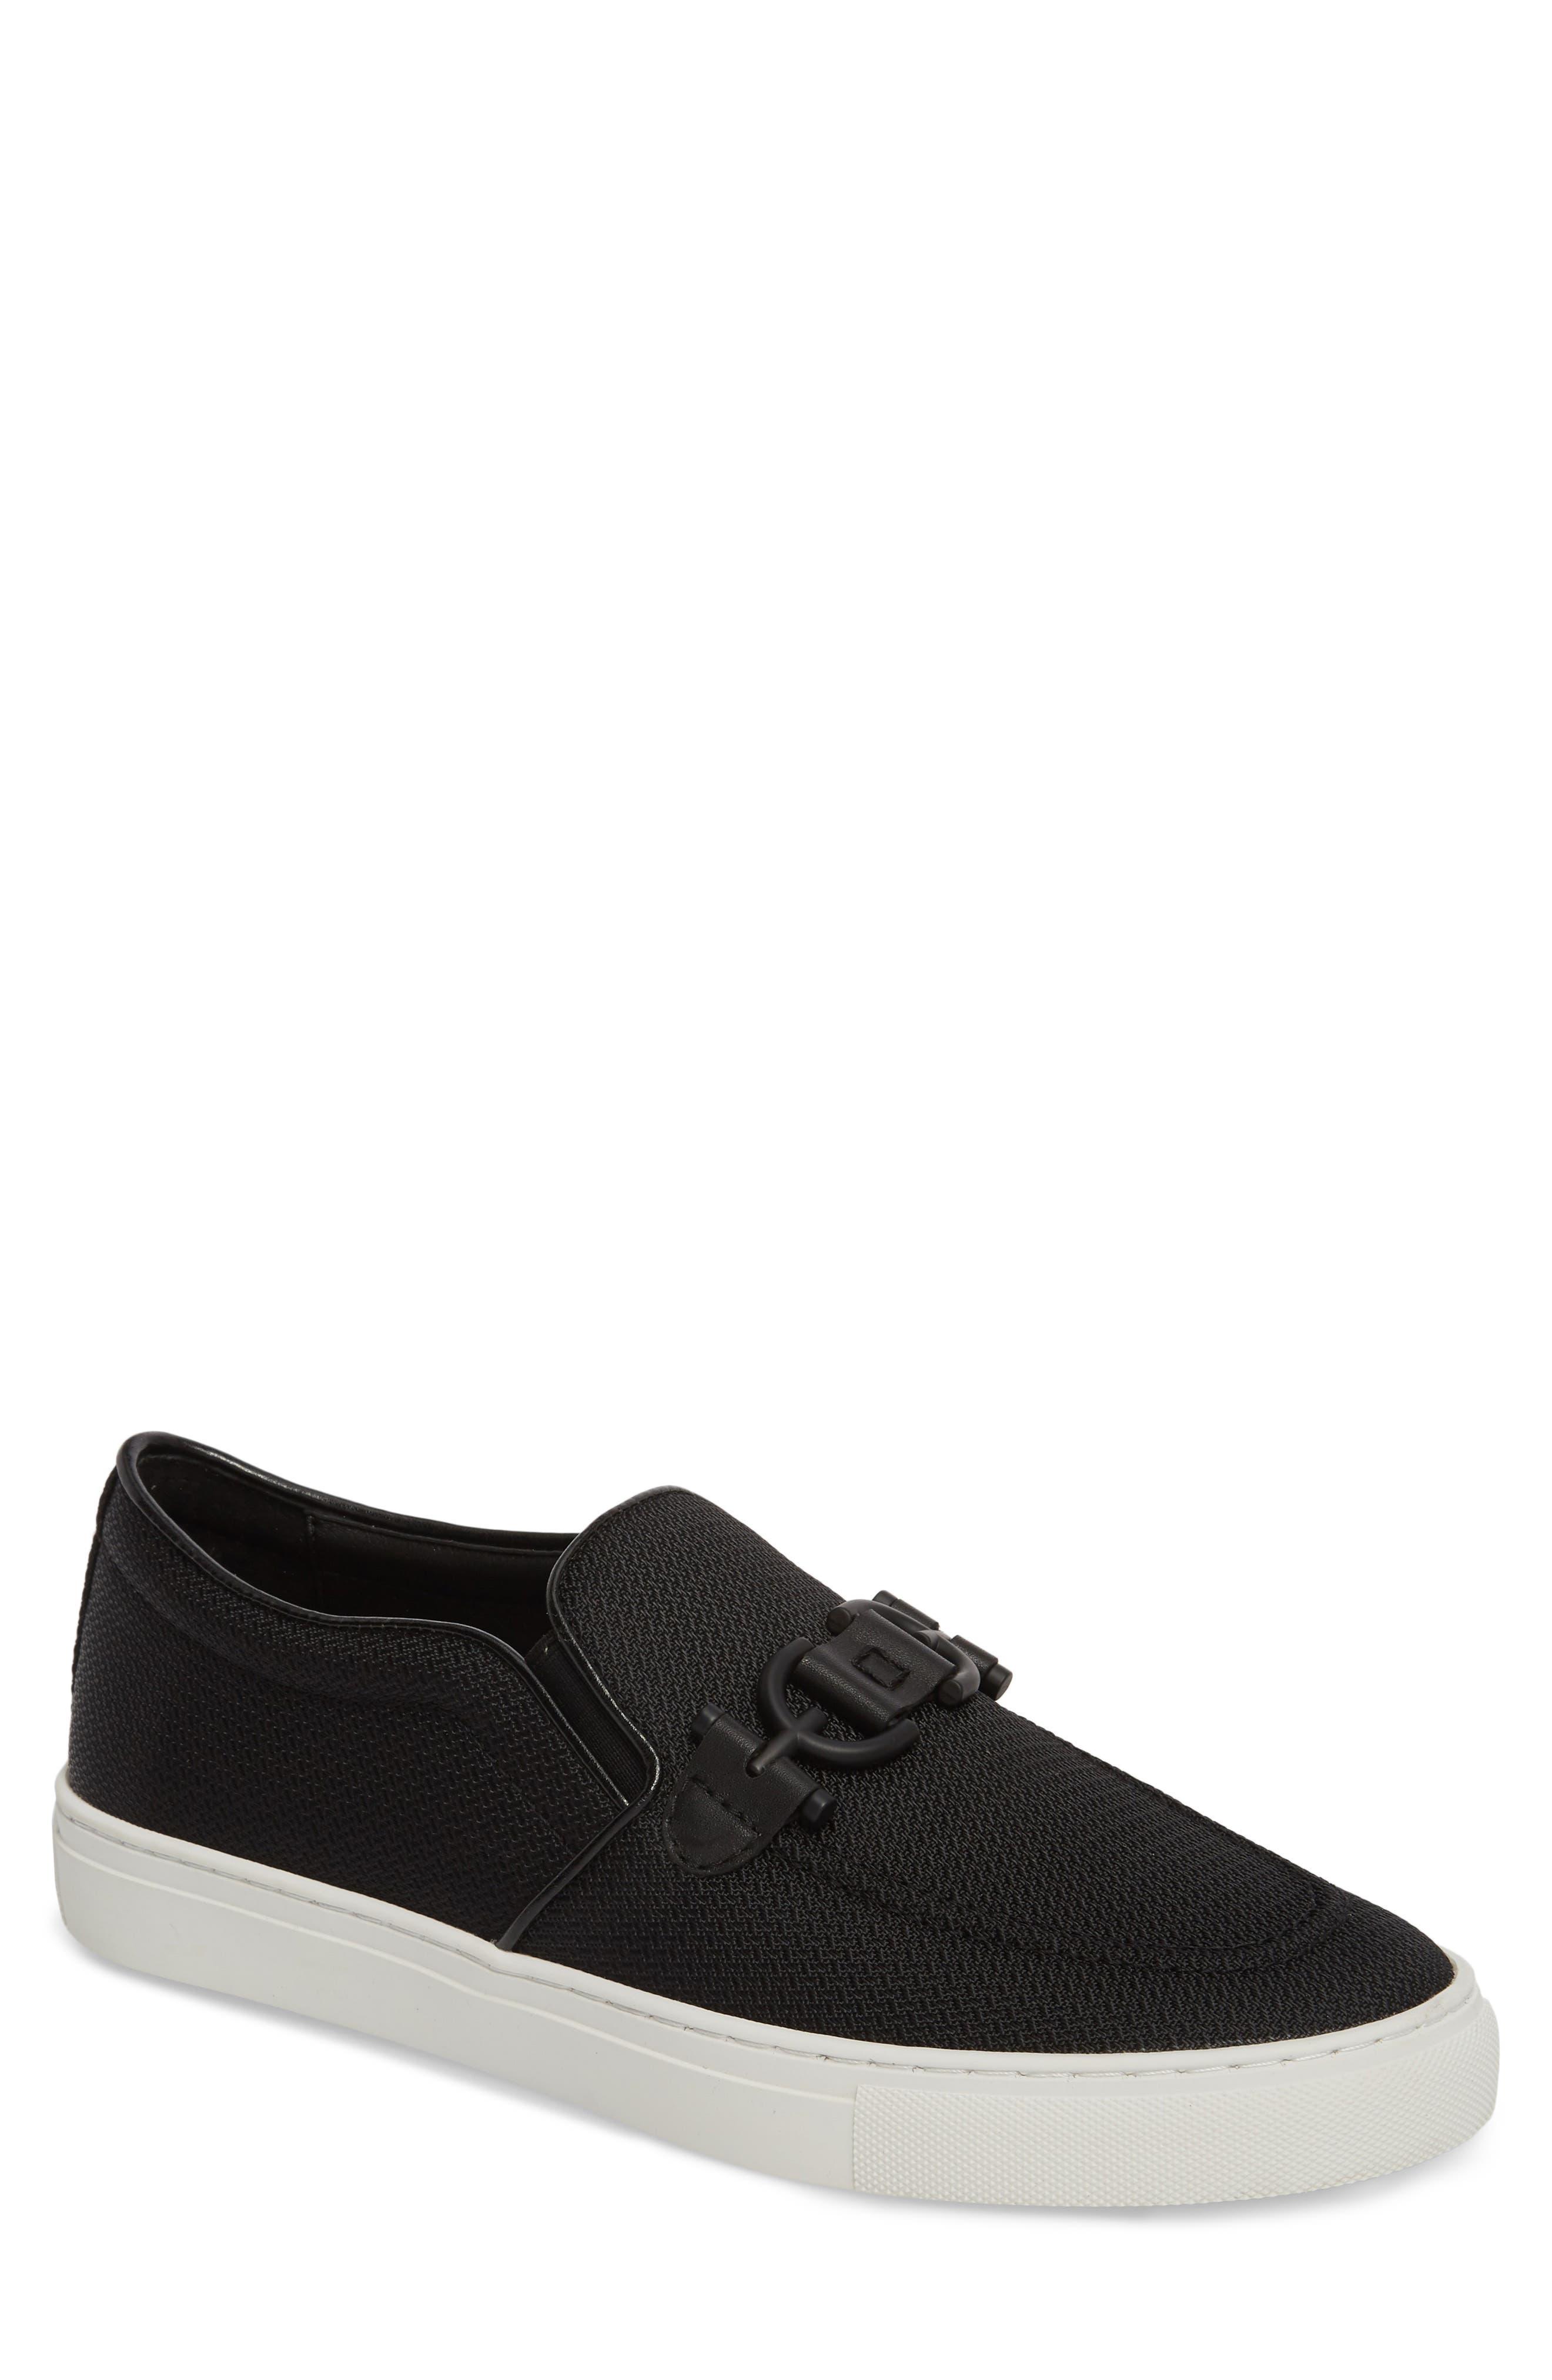 Andor Bit Slip-On Sneaker,                             Main thumbnail 1, color,                             001